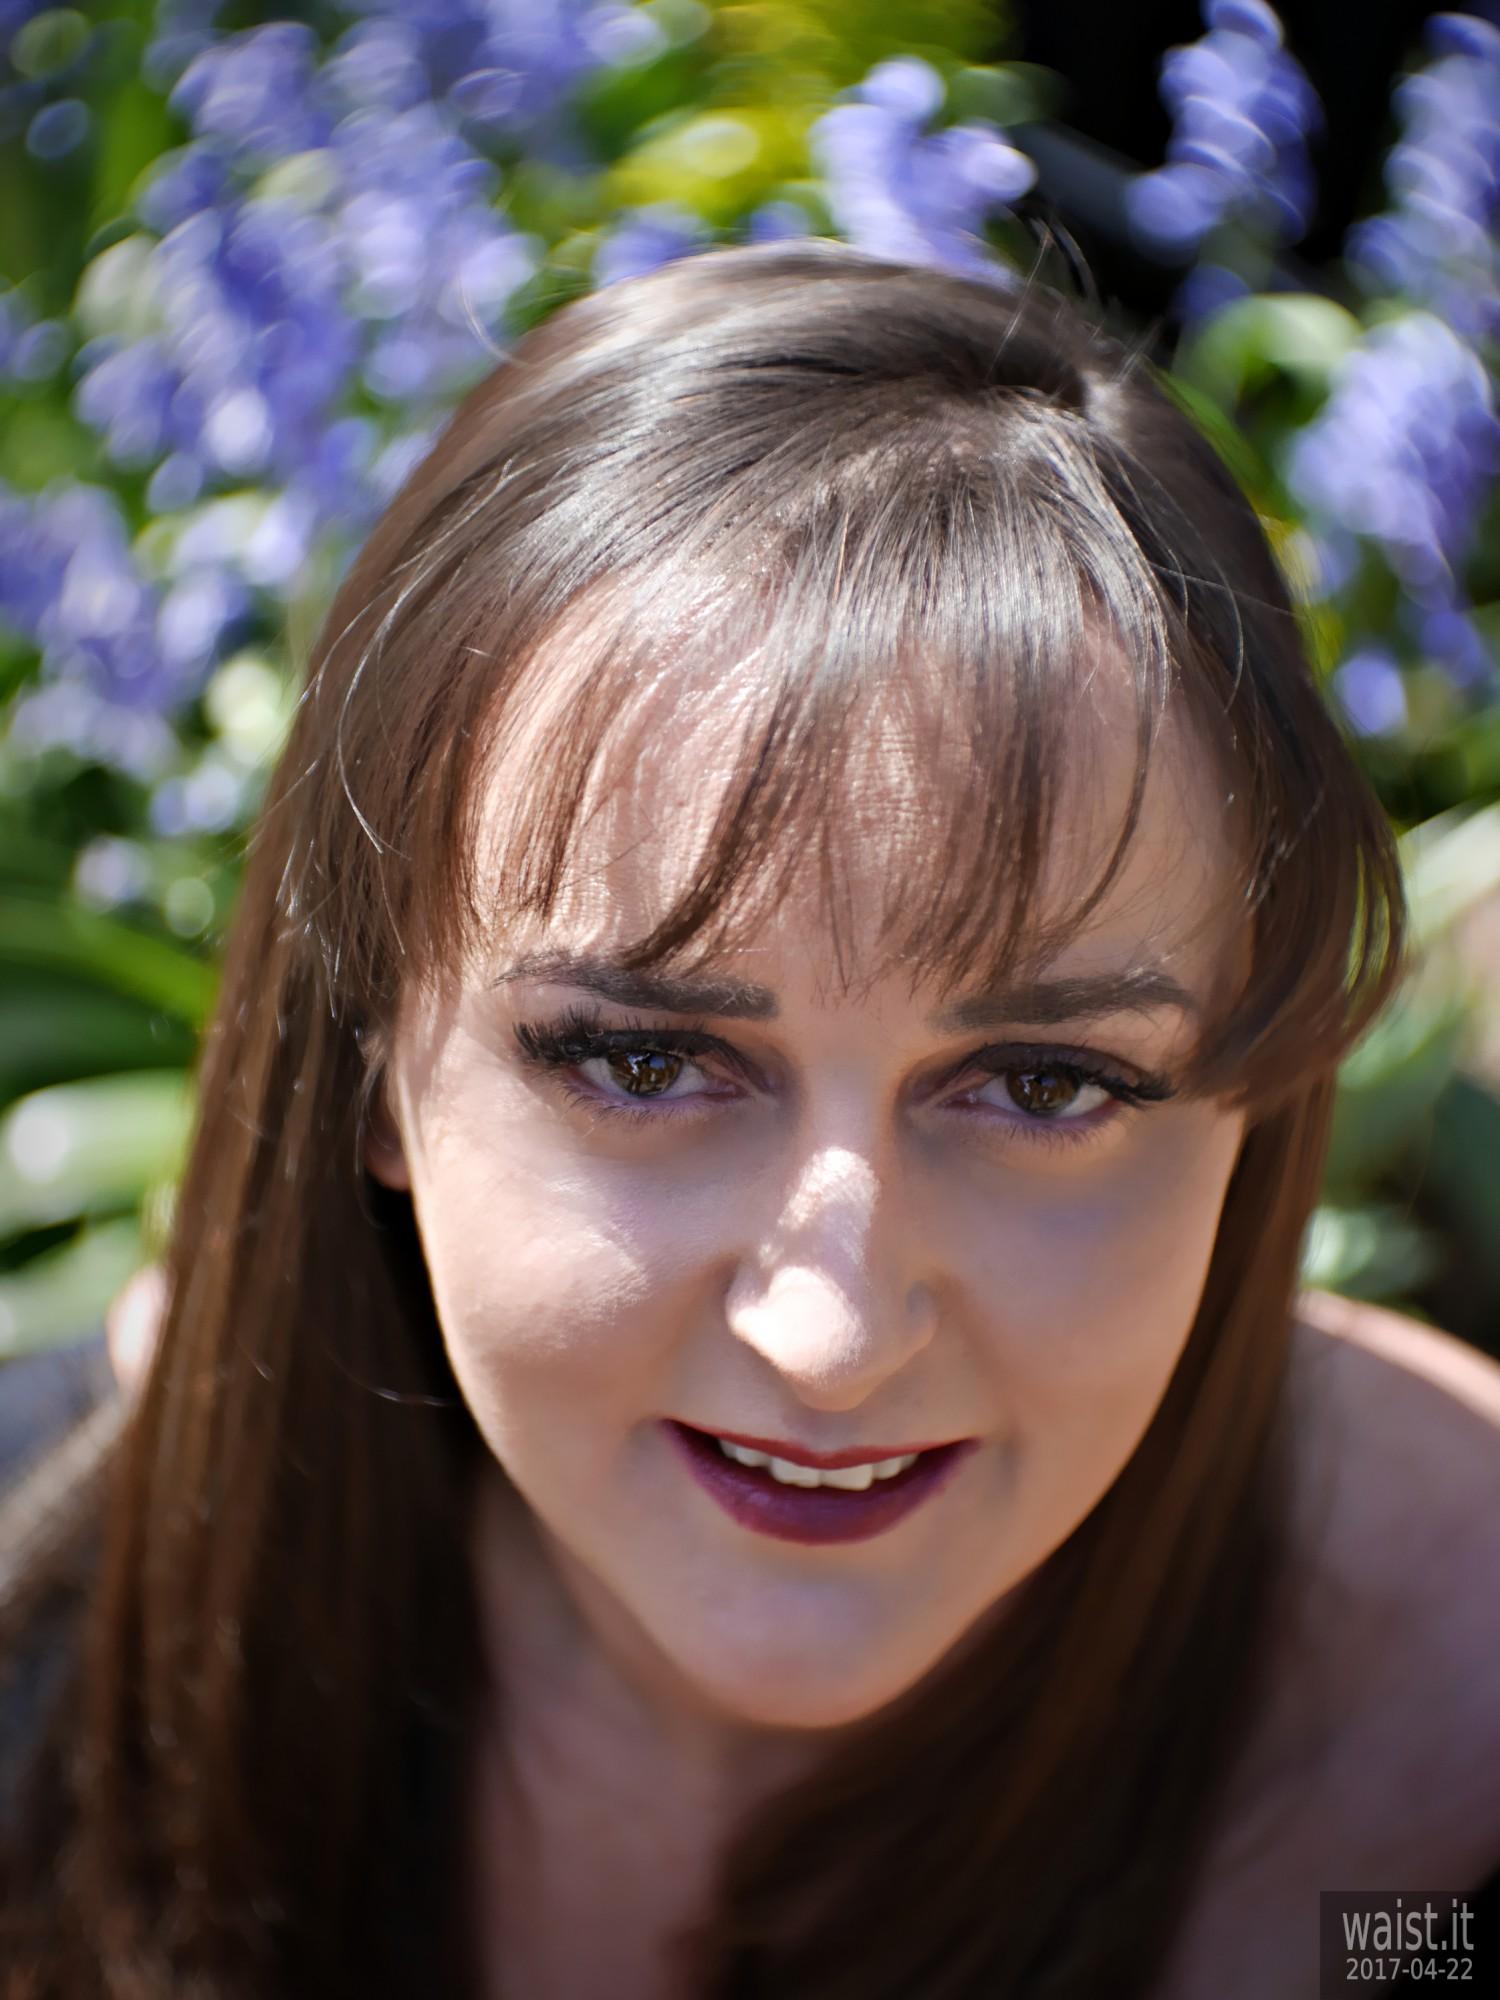 2017-04-22 Patsy headshot with Petzval type lens